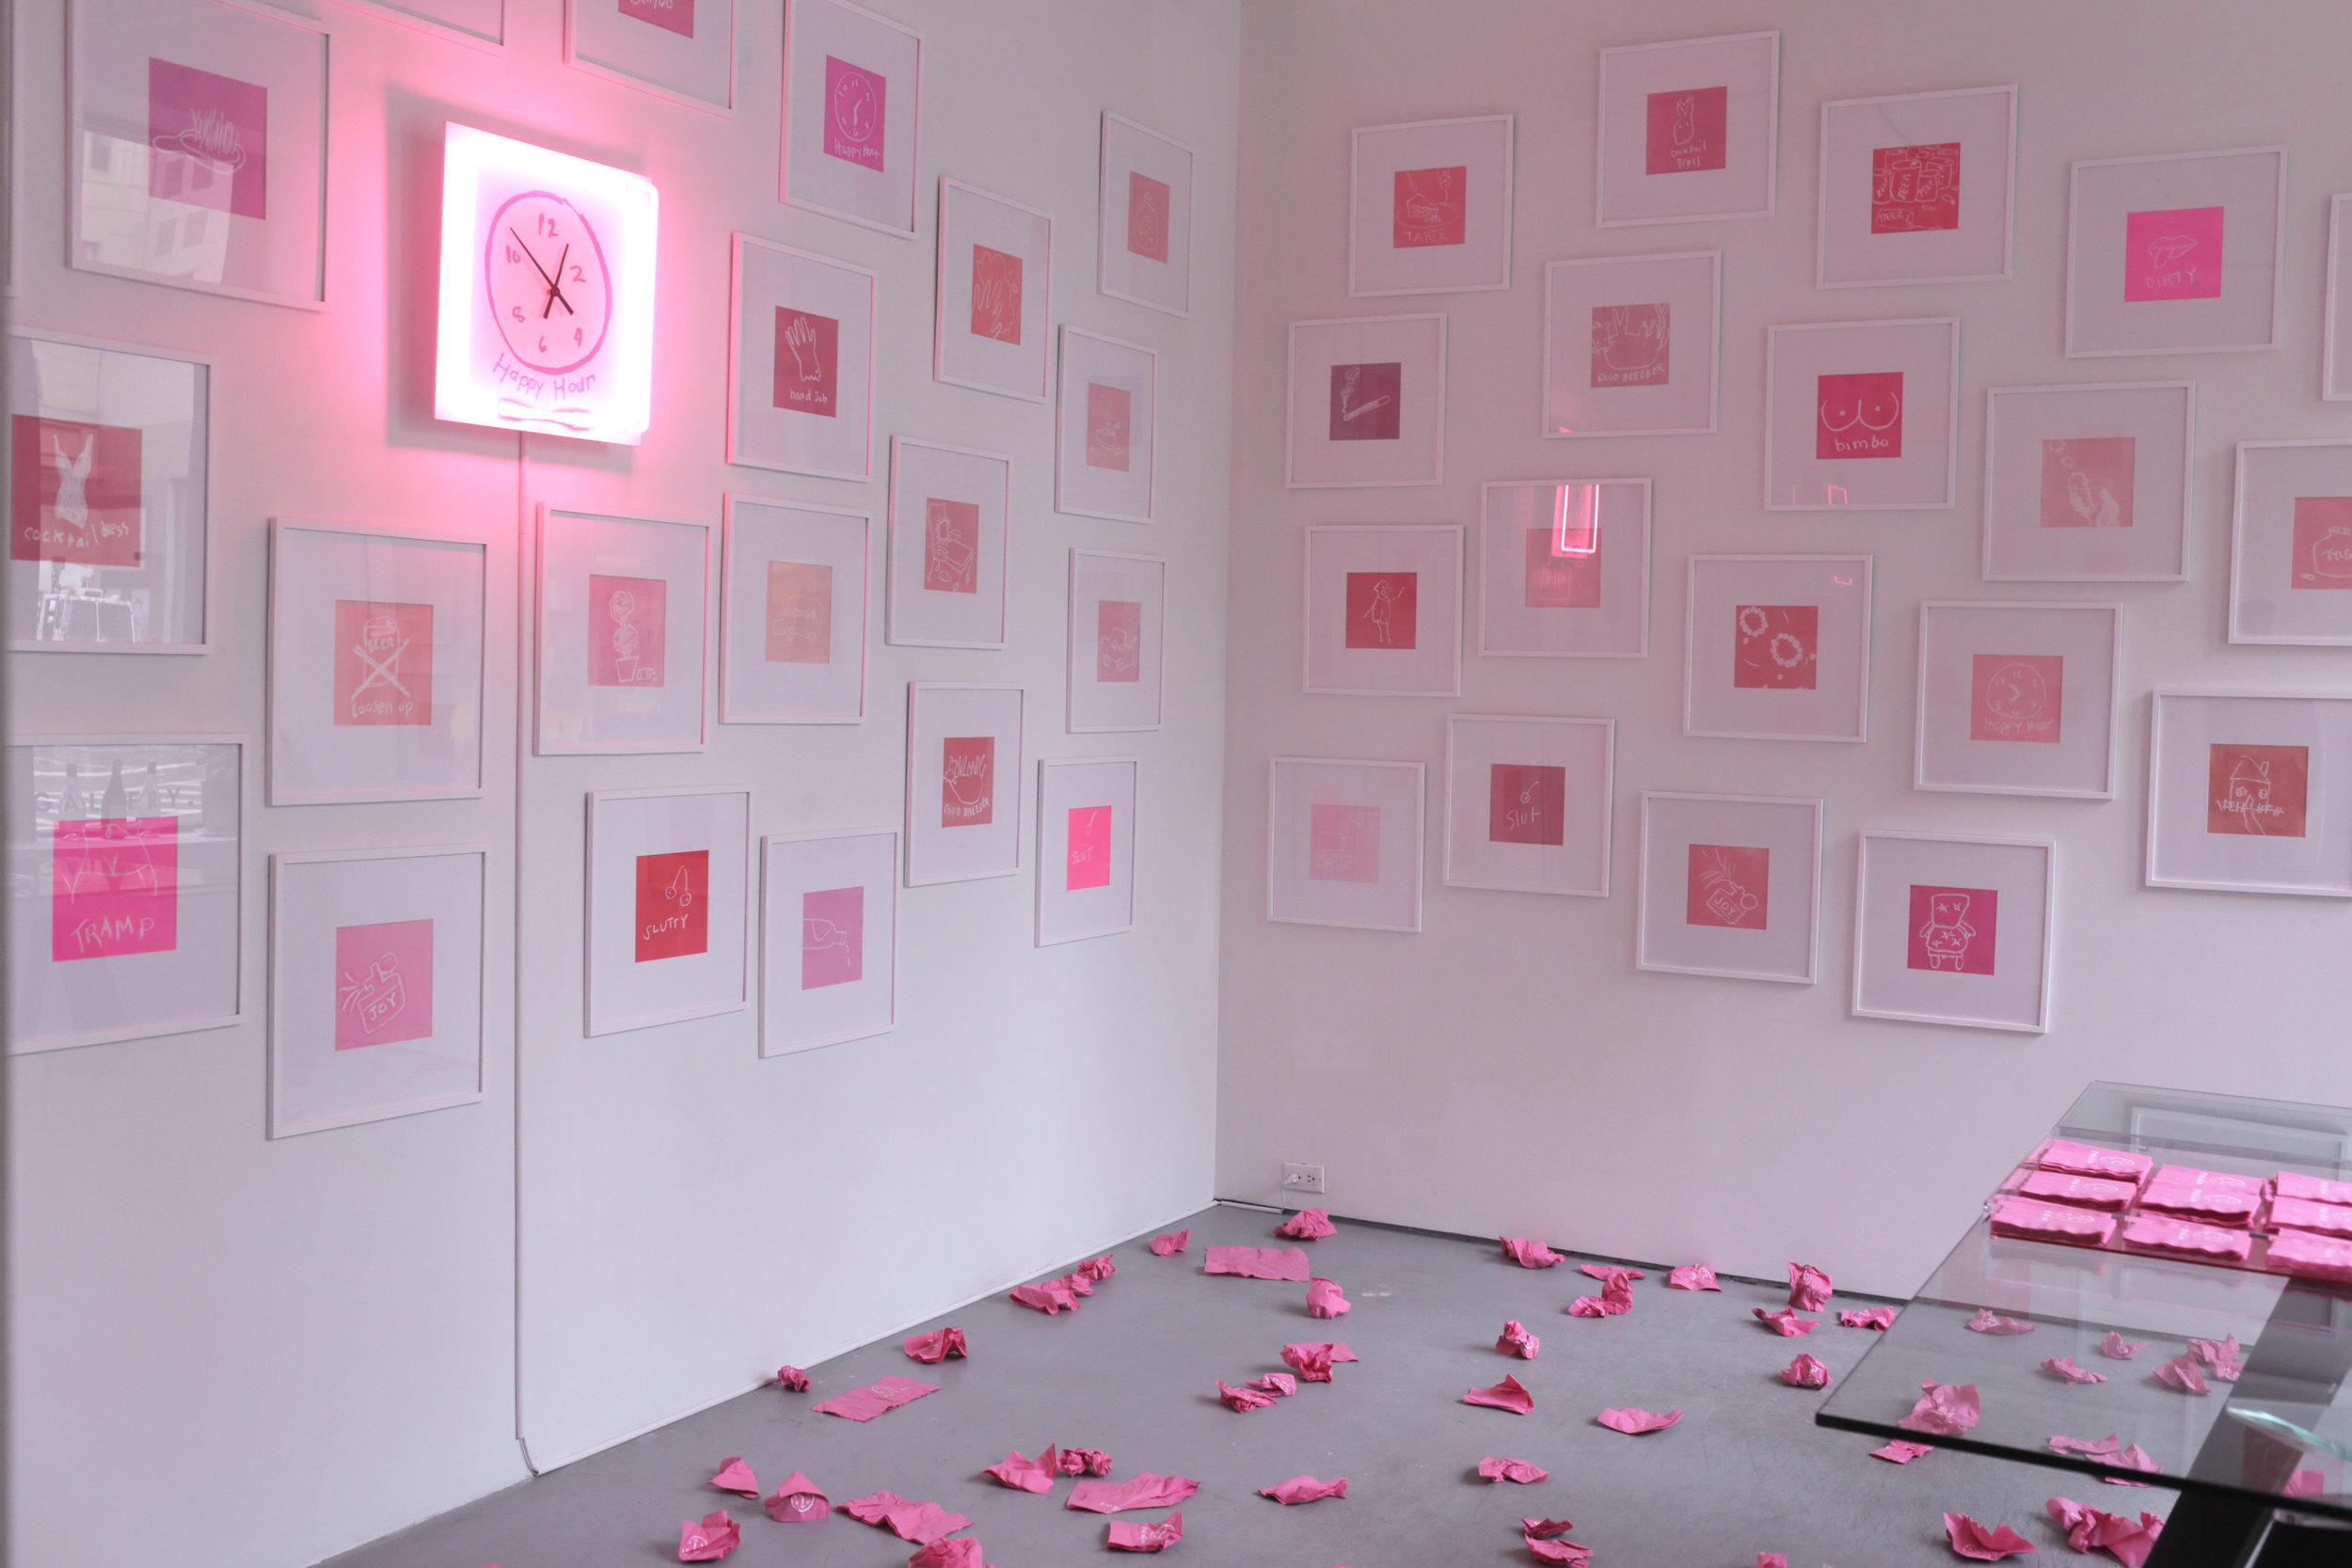 Rose Room with Happy Hour Drawings.jpg